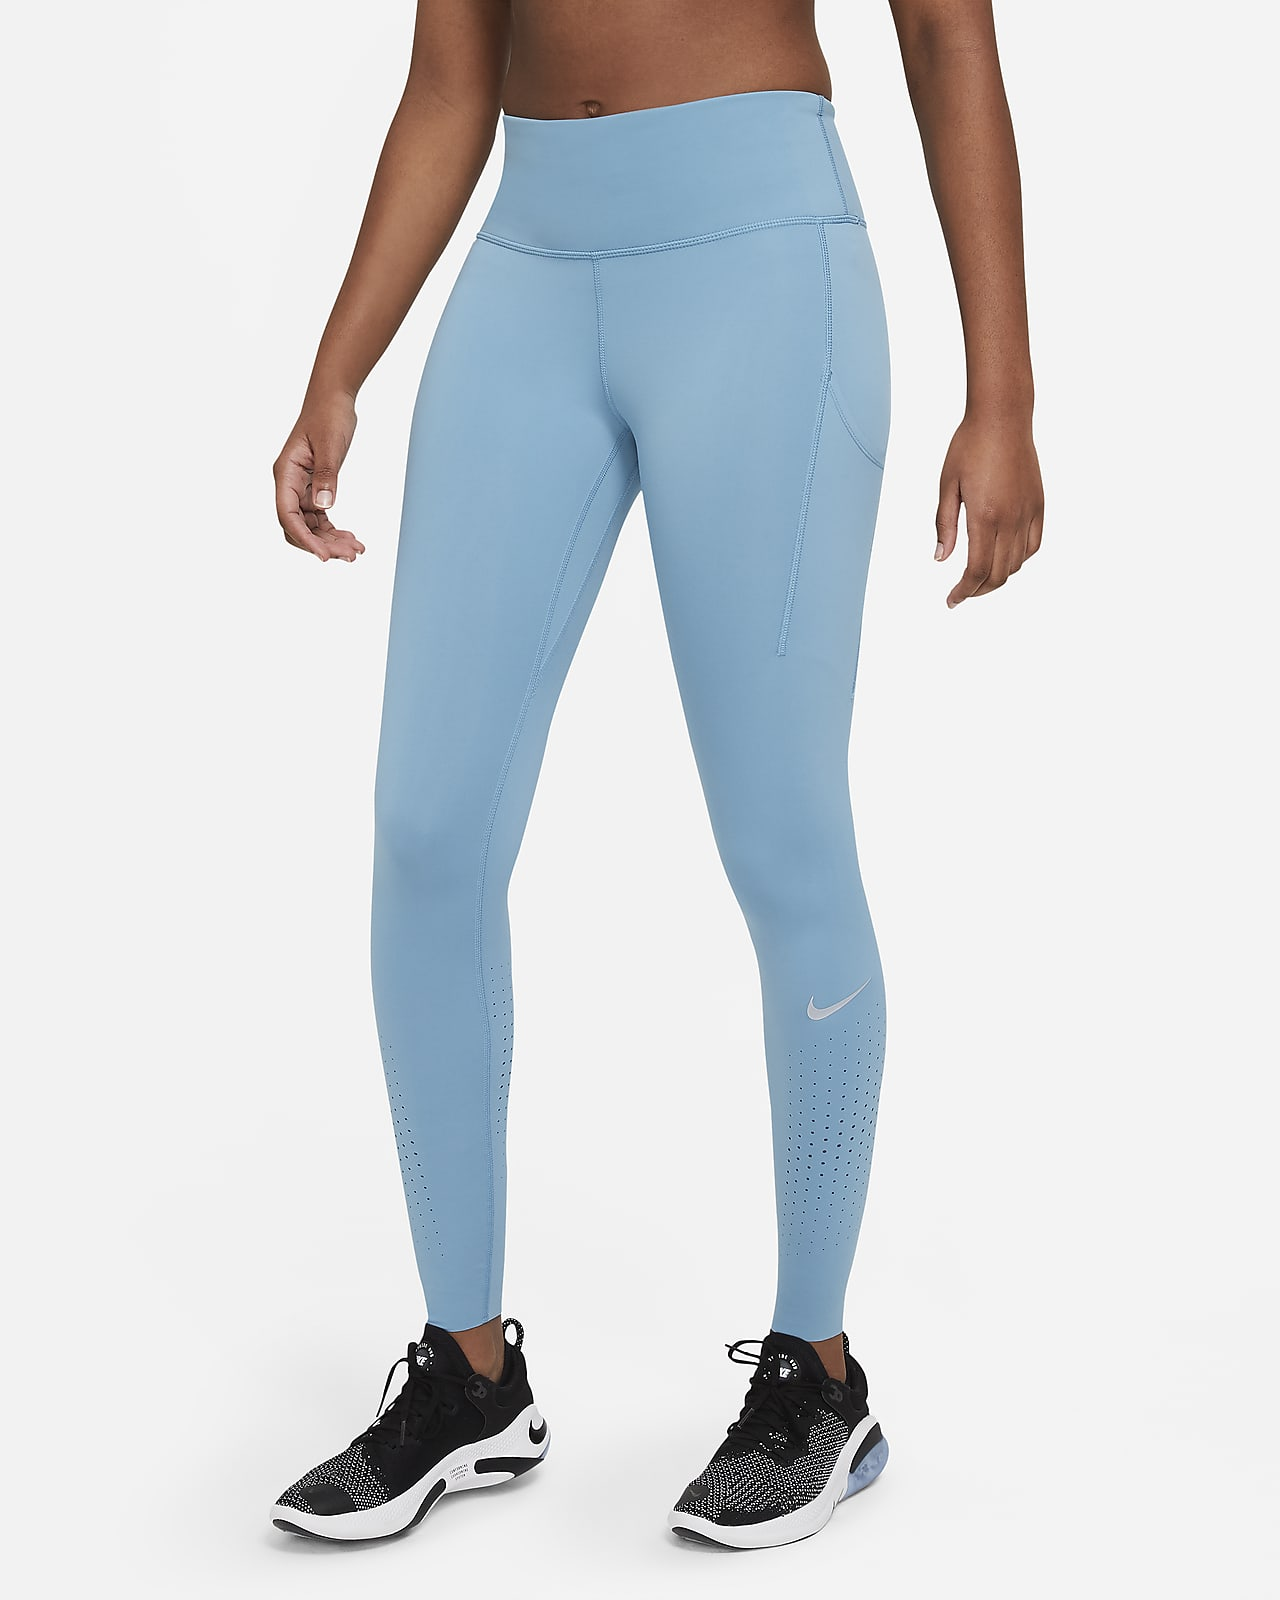 Nike Epic Luxe Hardlooplegging voor dames